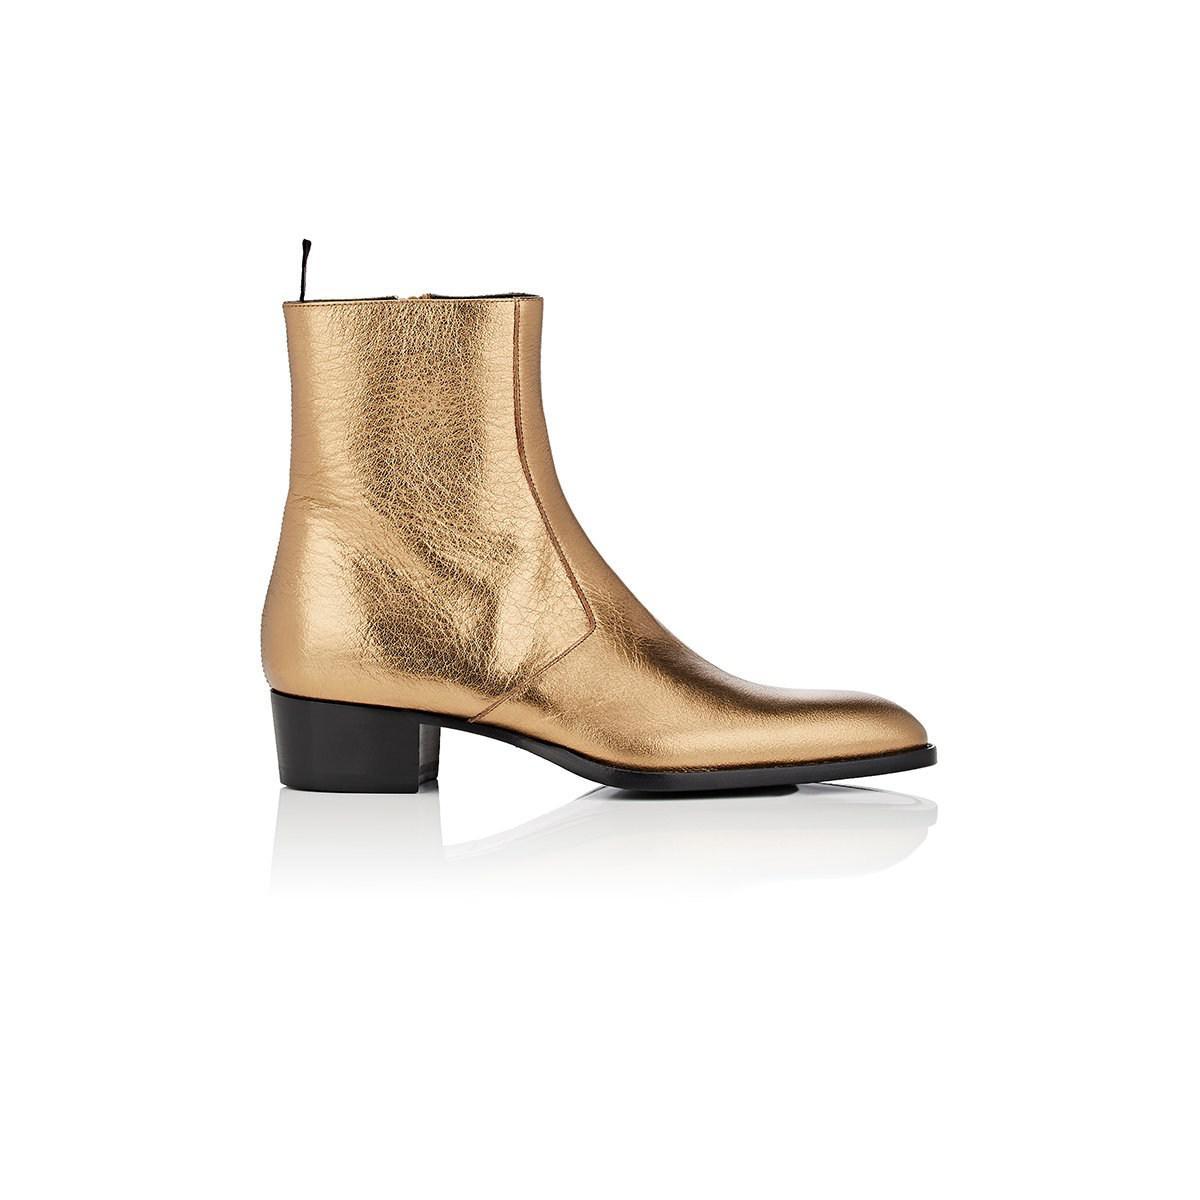 891c0a11 Saint Laurent Wyatt 40mm Men's Metallic Leather Ankle Boots Gold for men